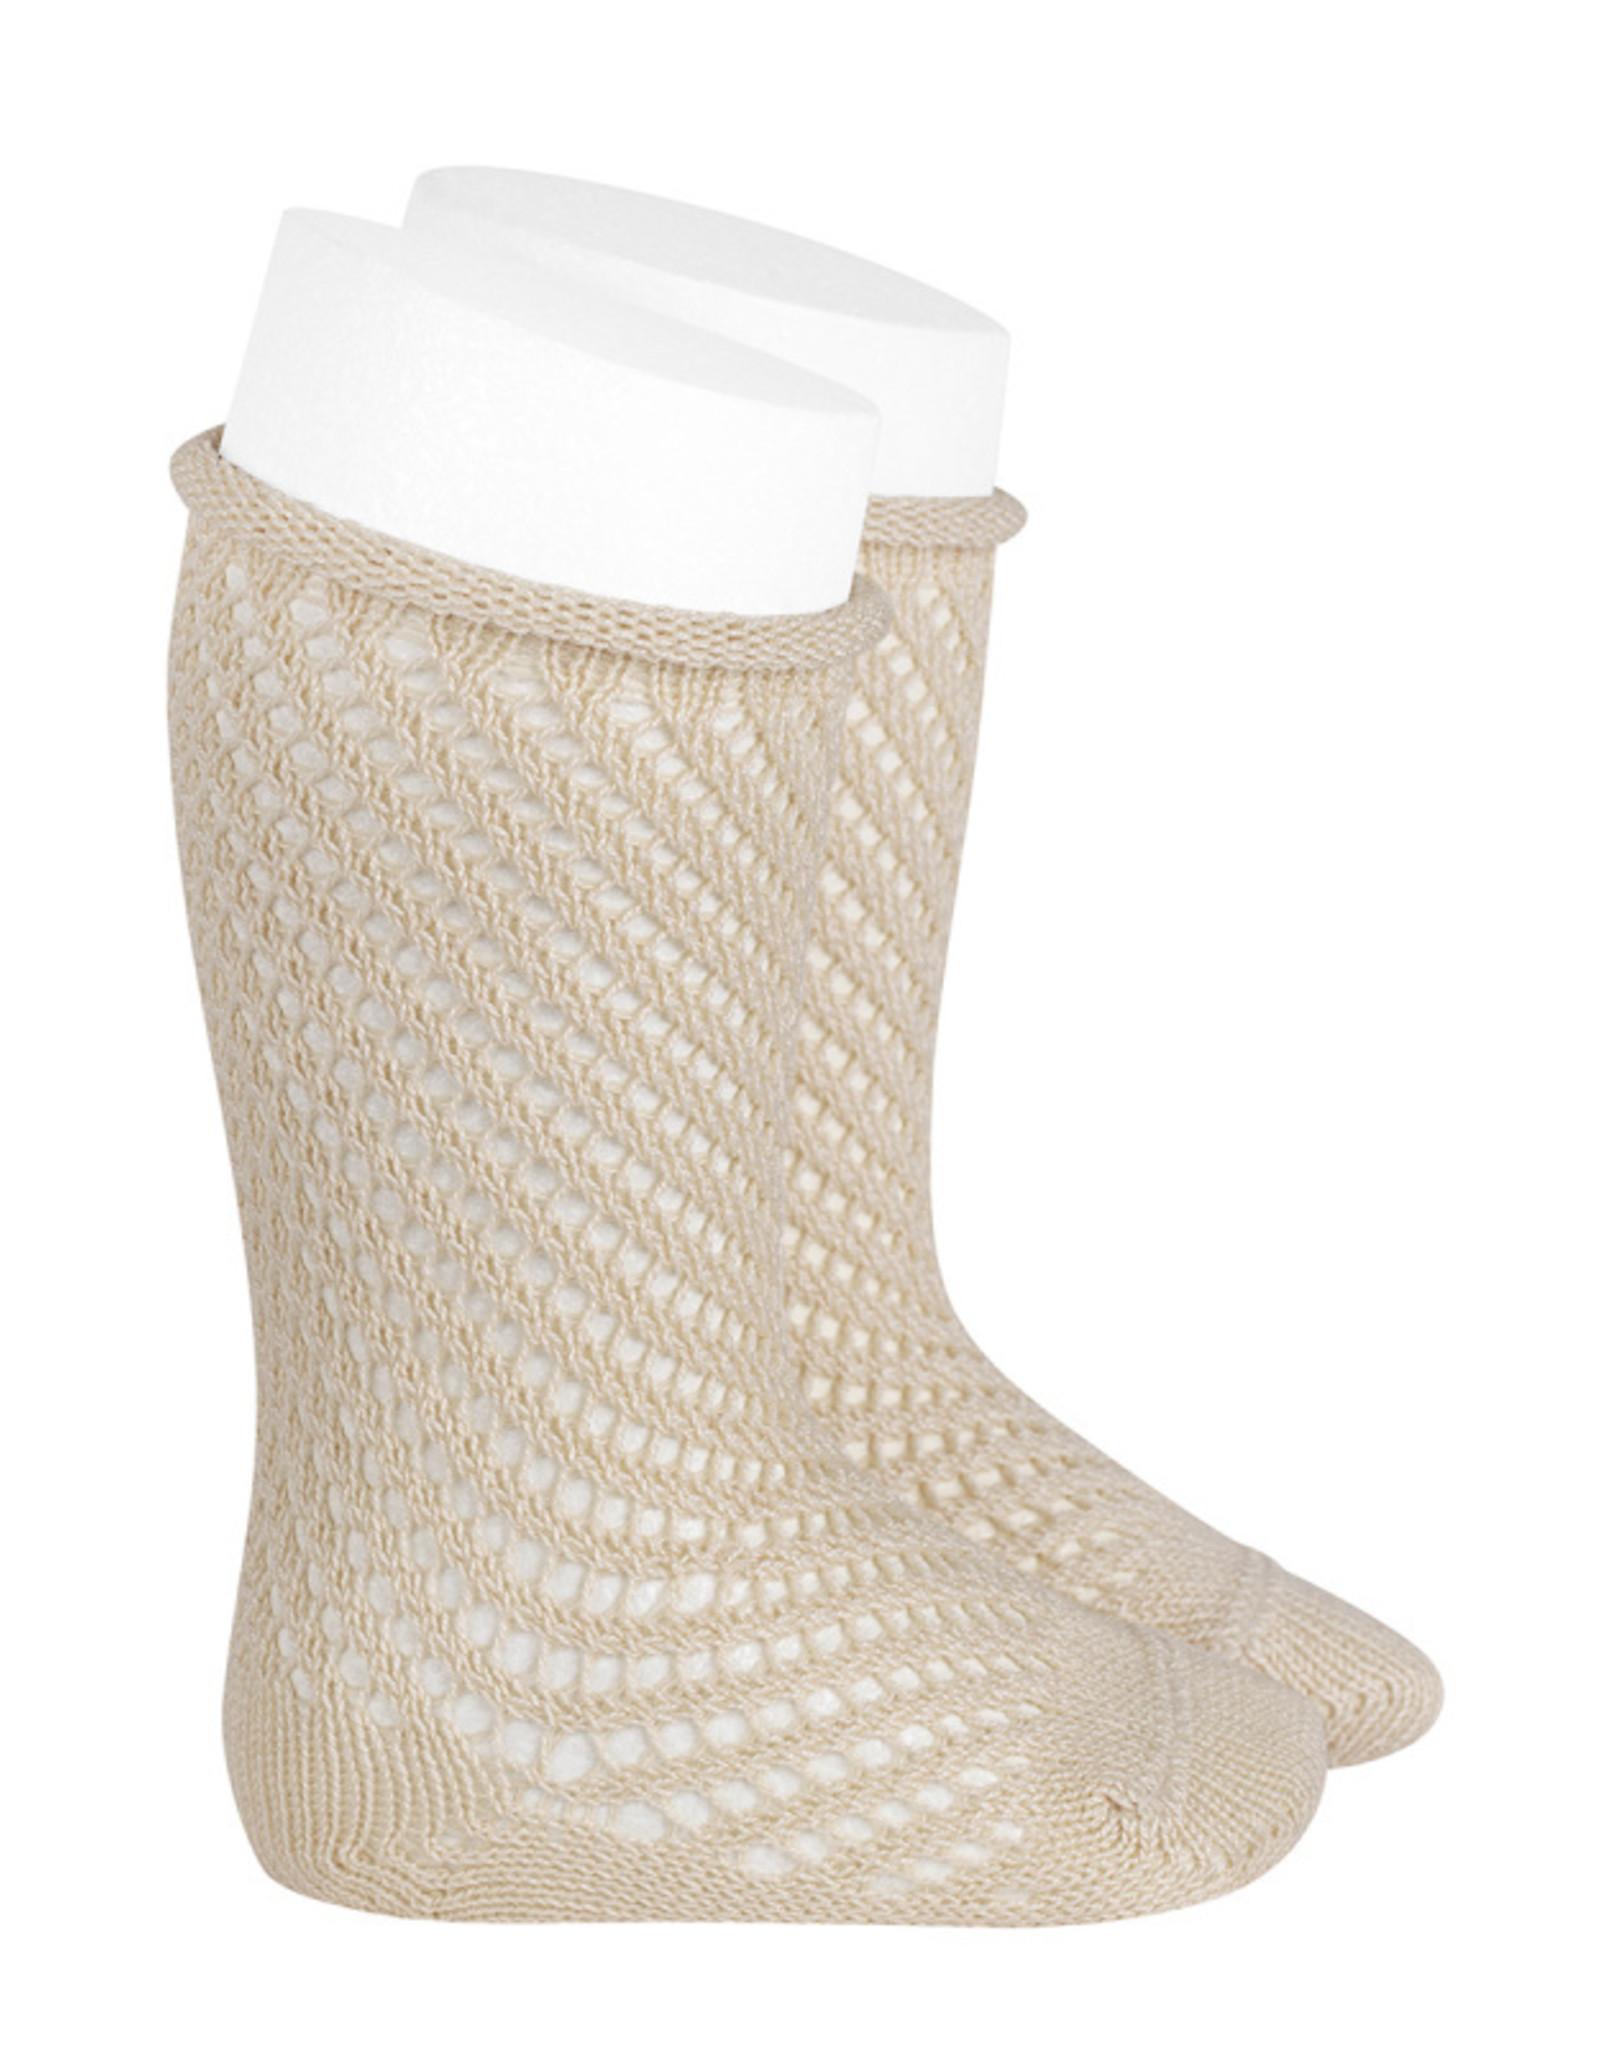 Condor Condor Crochet Knee Sock with Rolled Cuff